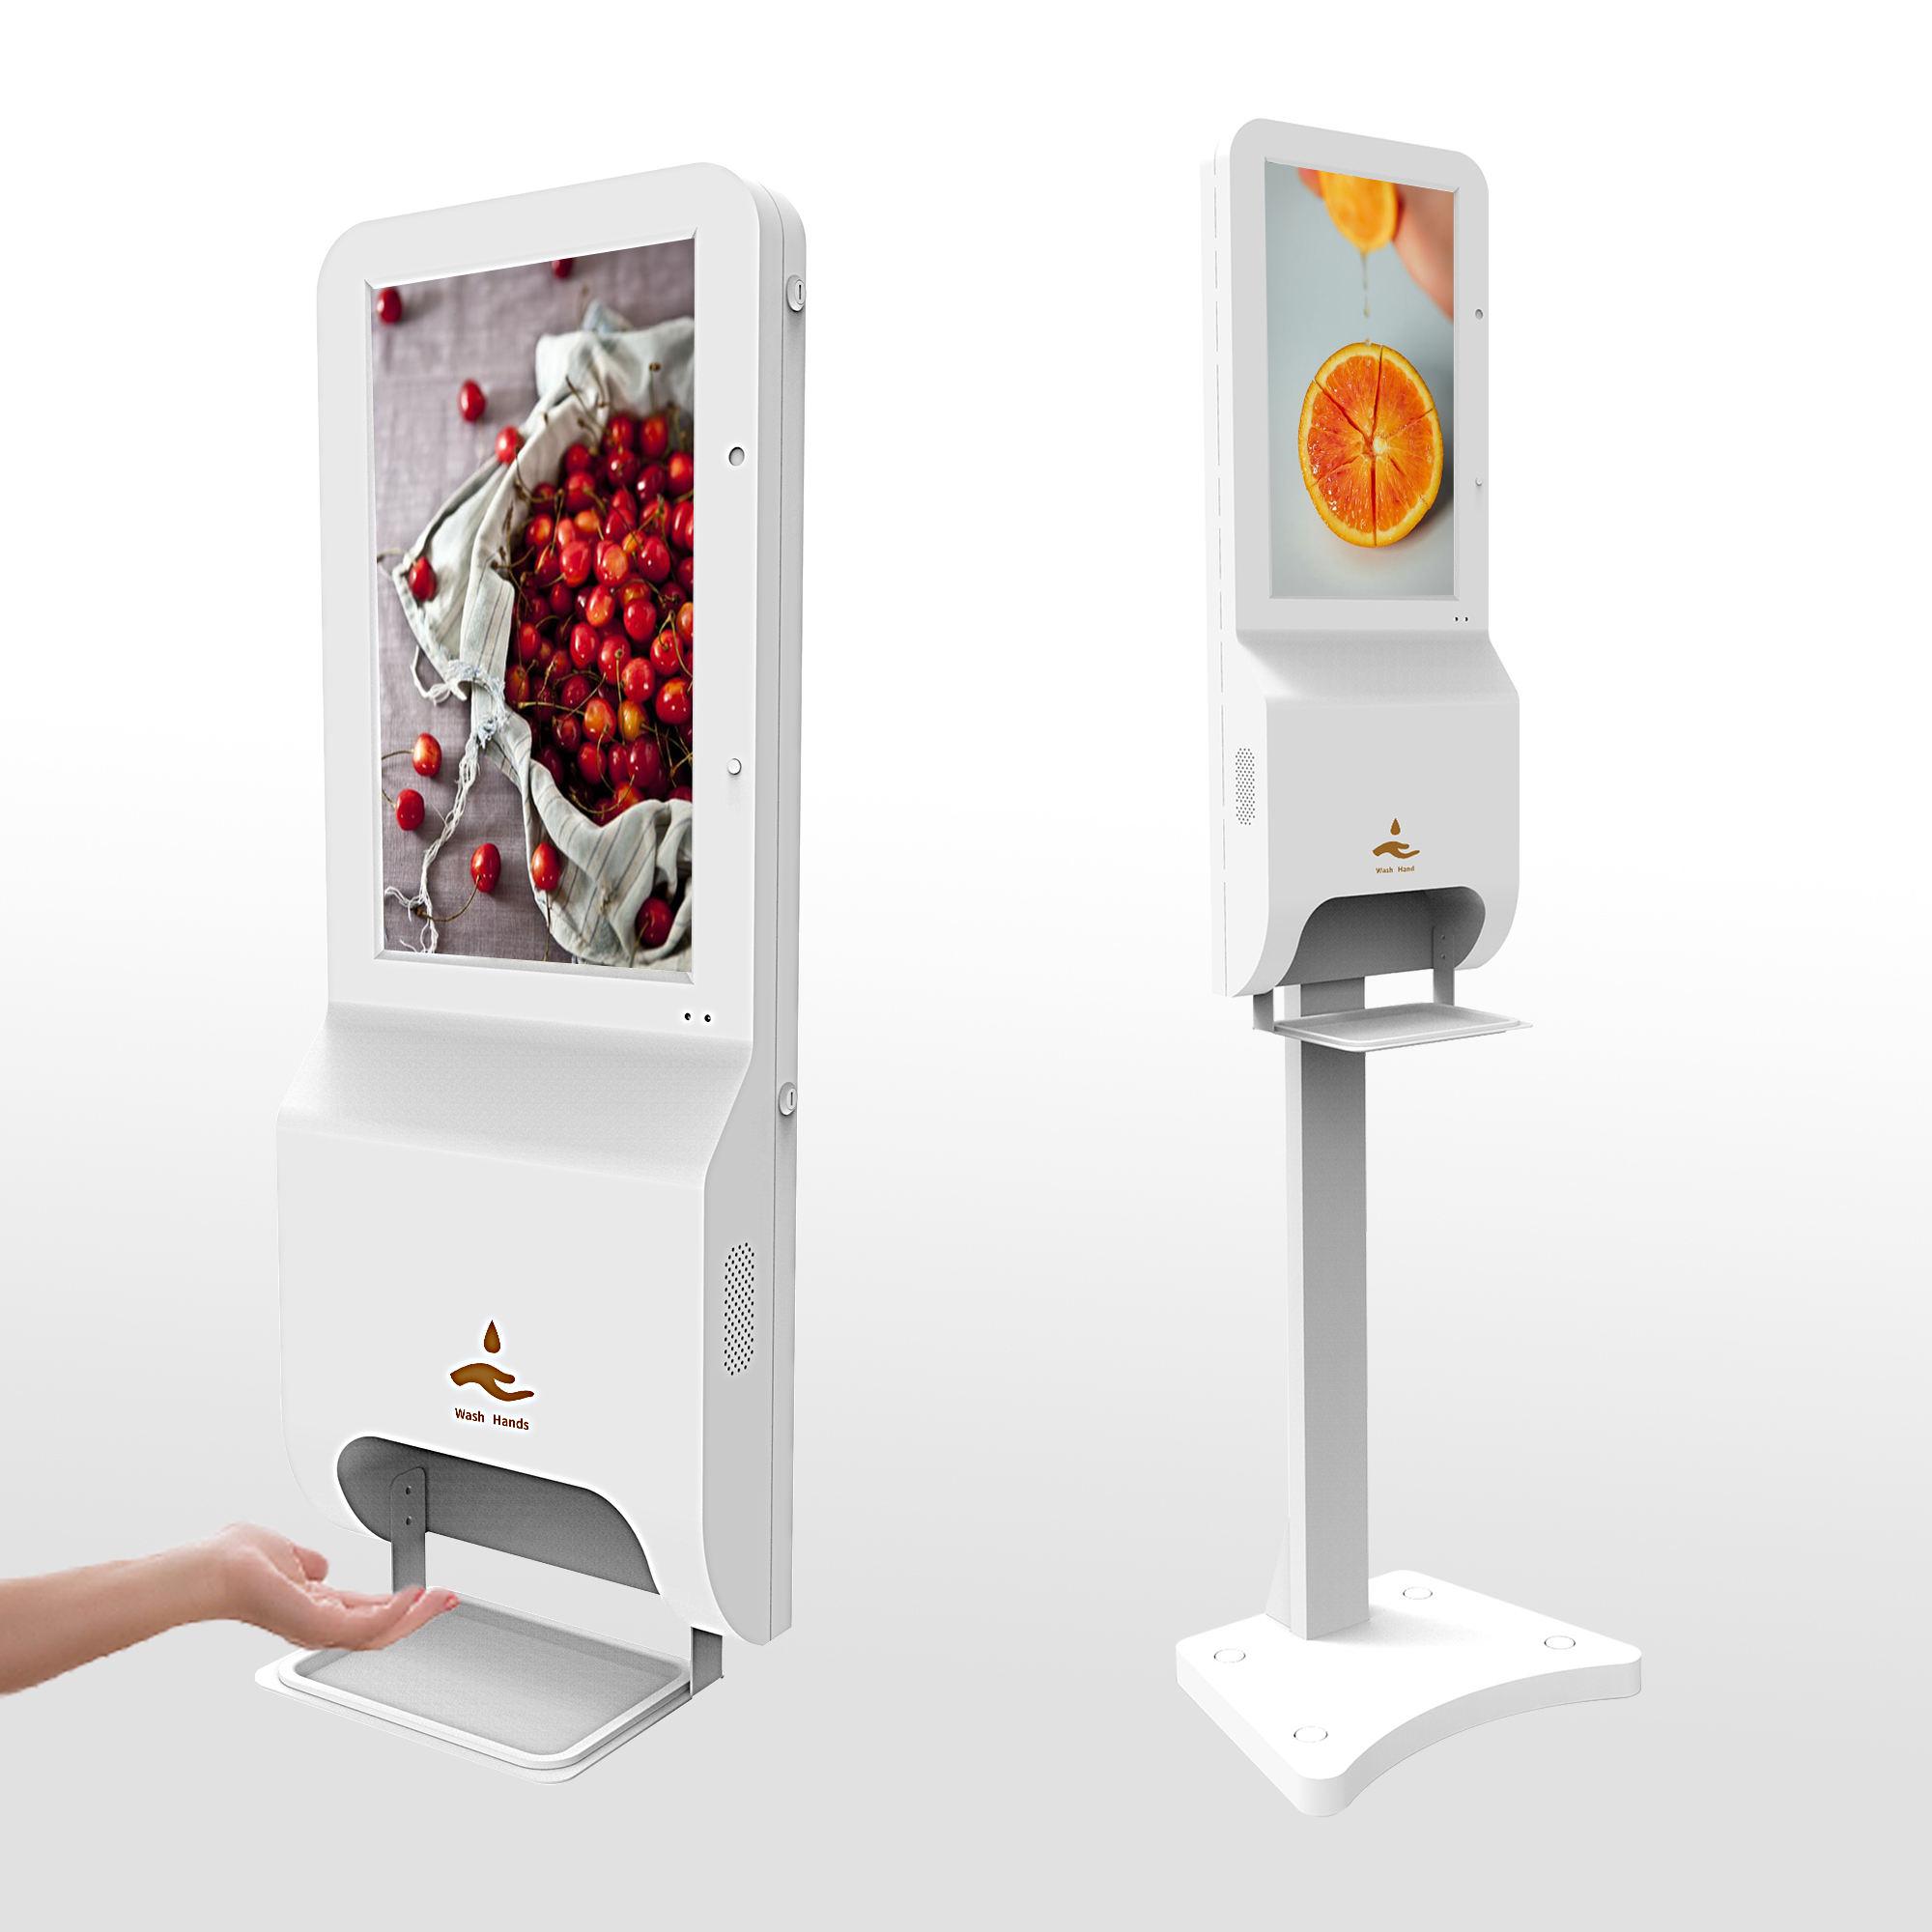 Digital advertising player desinfecting floor alcohol sanitizing gel dispenser for hands infrared automatic hand sanitizer kiosk